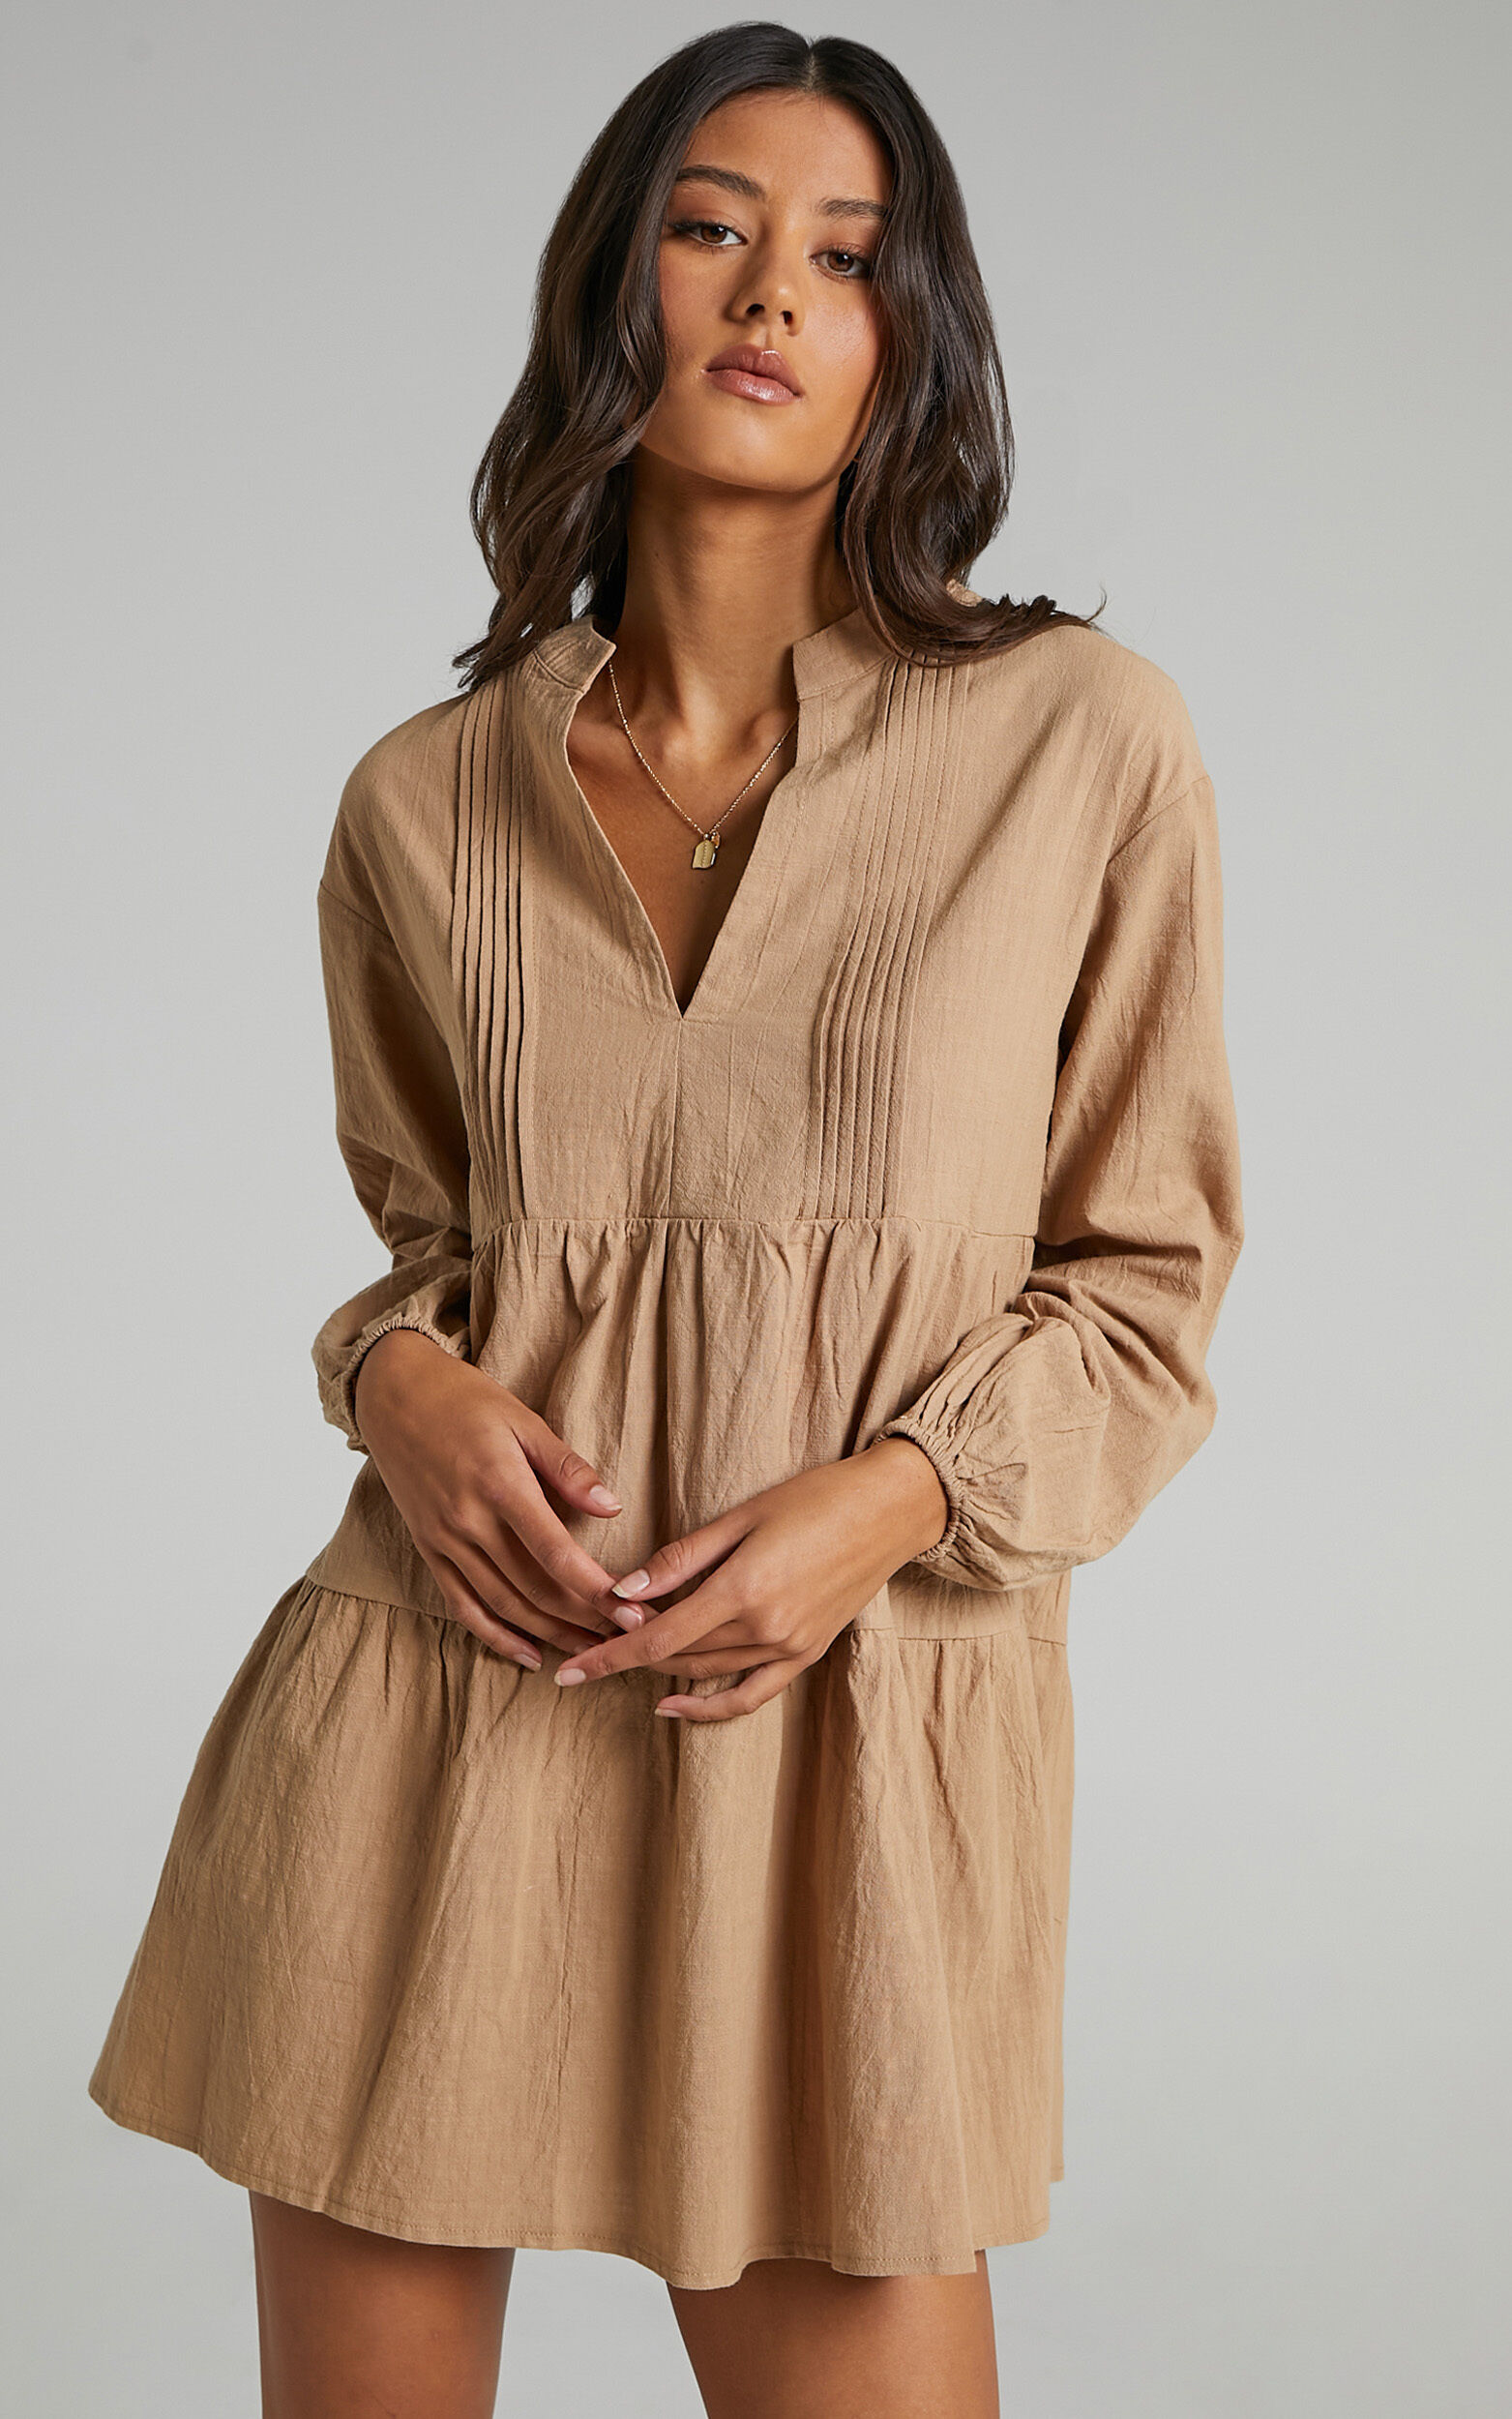 Estelita Dress in Beige - 04, BRN1, super-hi-res image number null